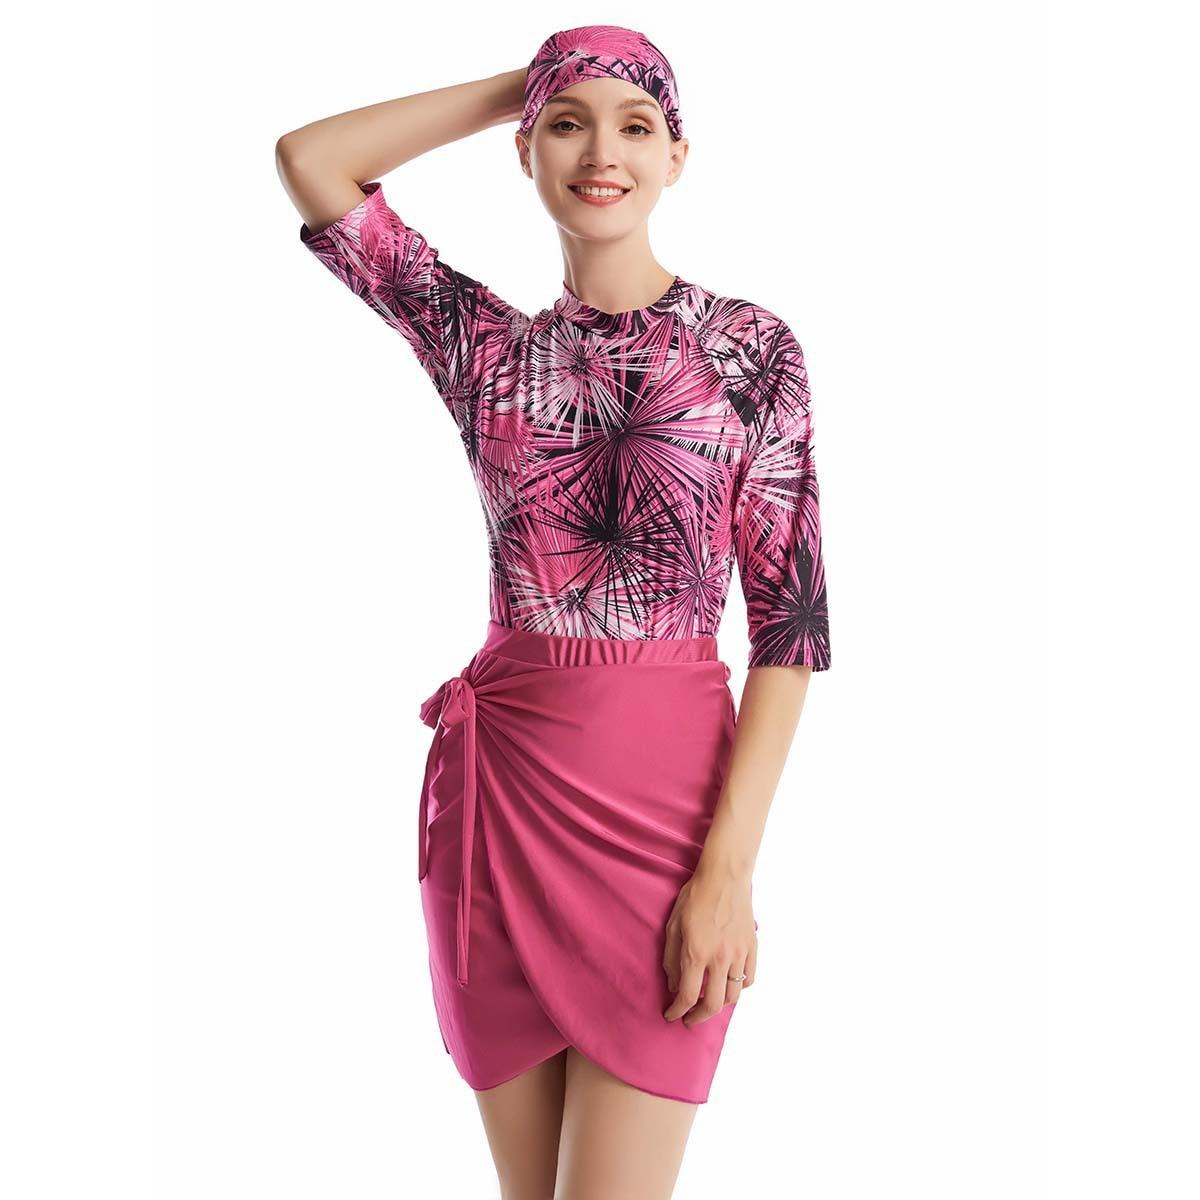 Frauen Rashguard Bademode Body + Rock + Kappe rose red 1.jpg